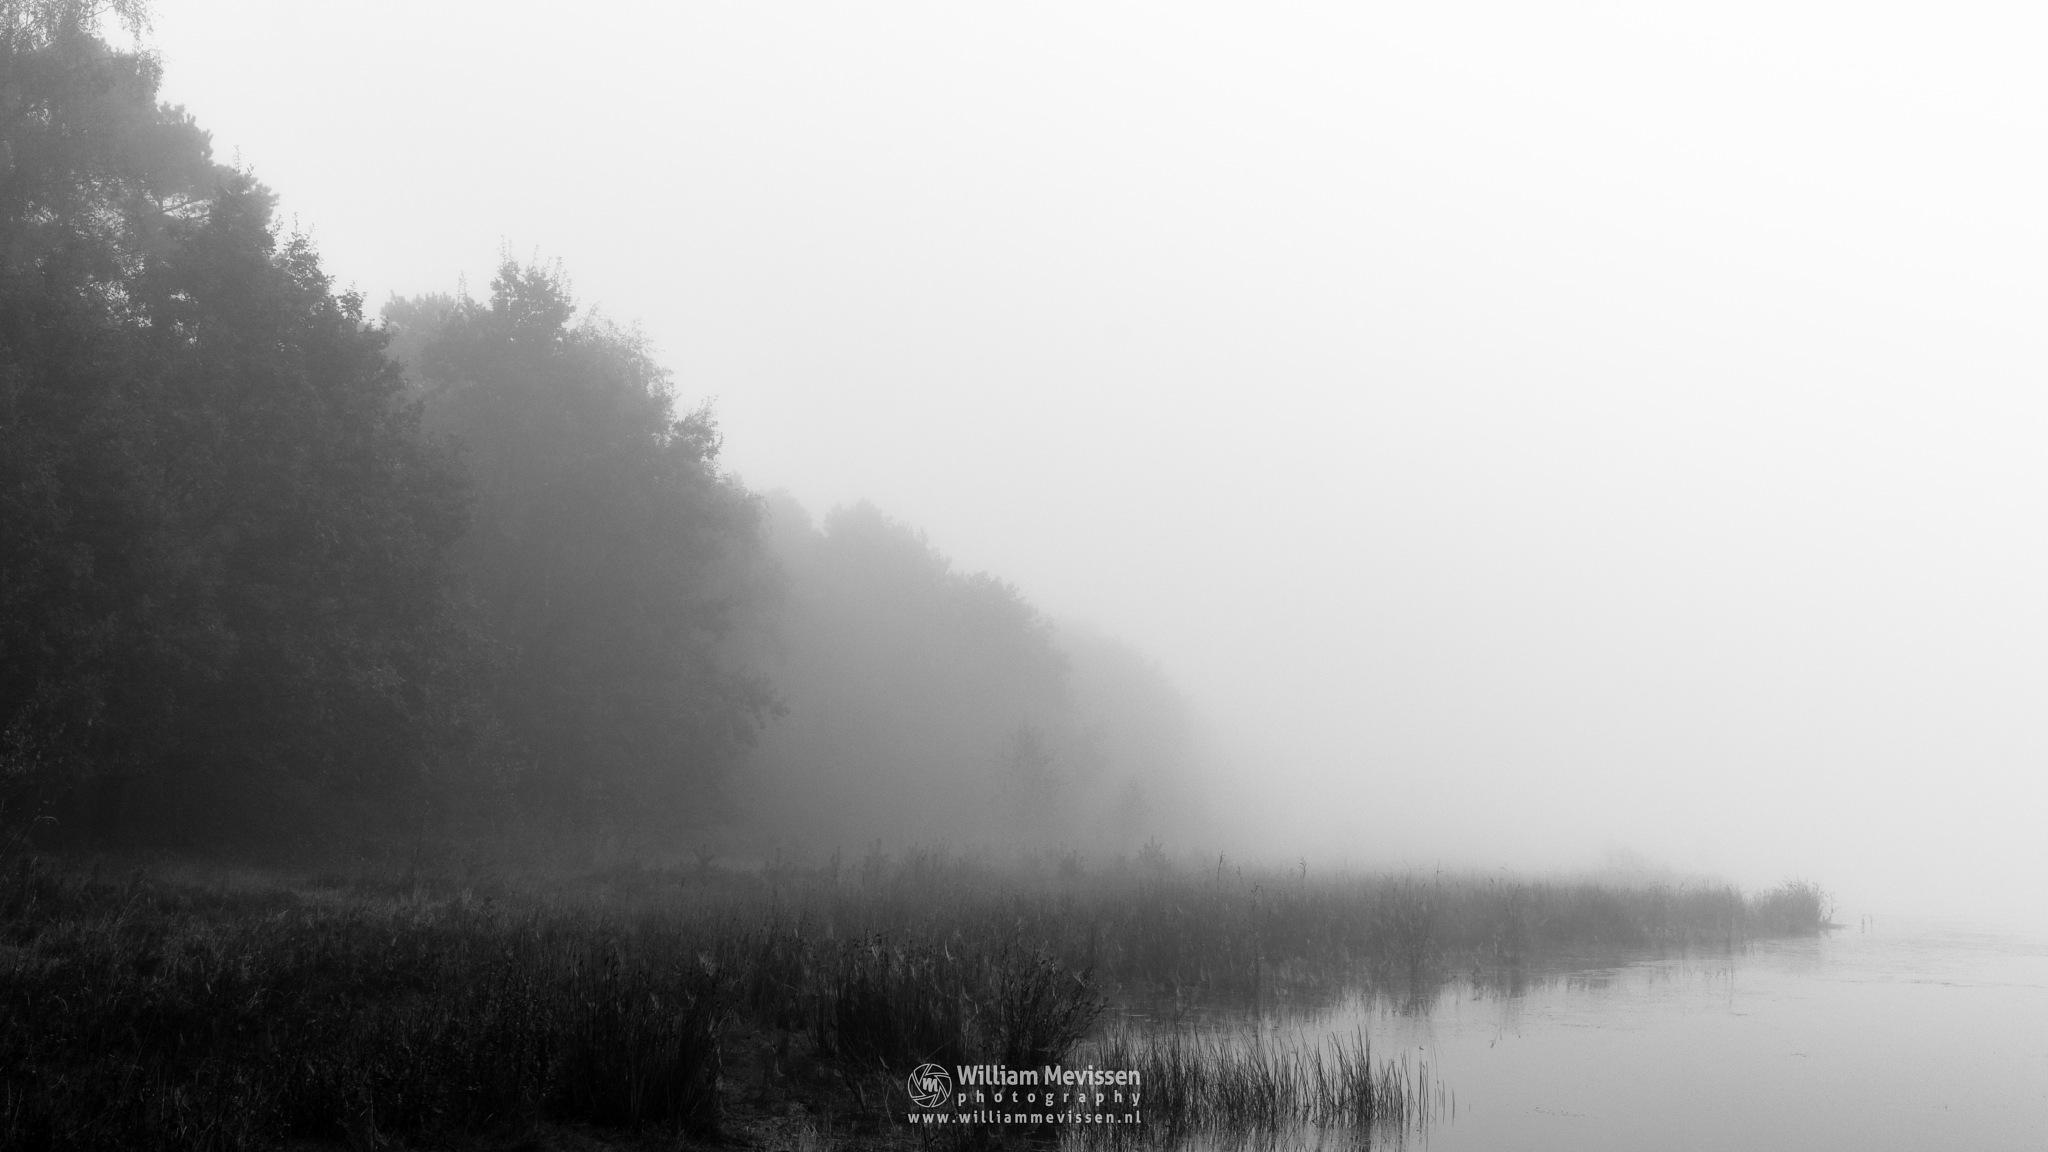 Vanishing Fog by William Mevissen